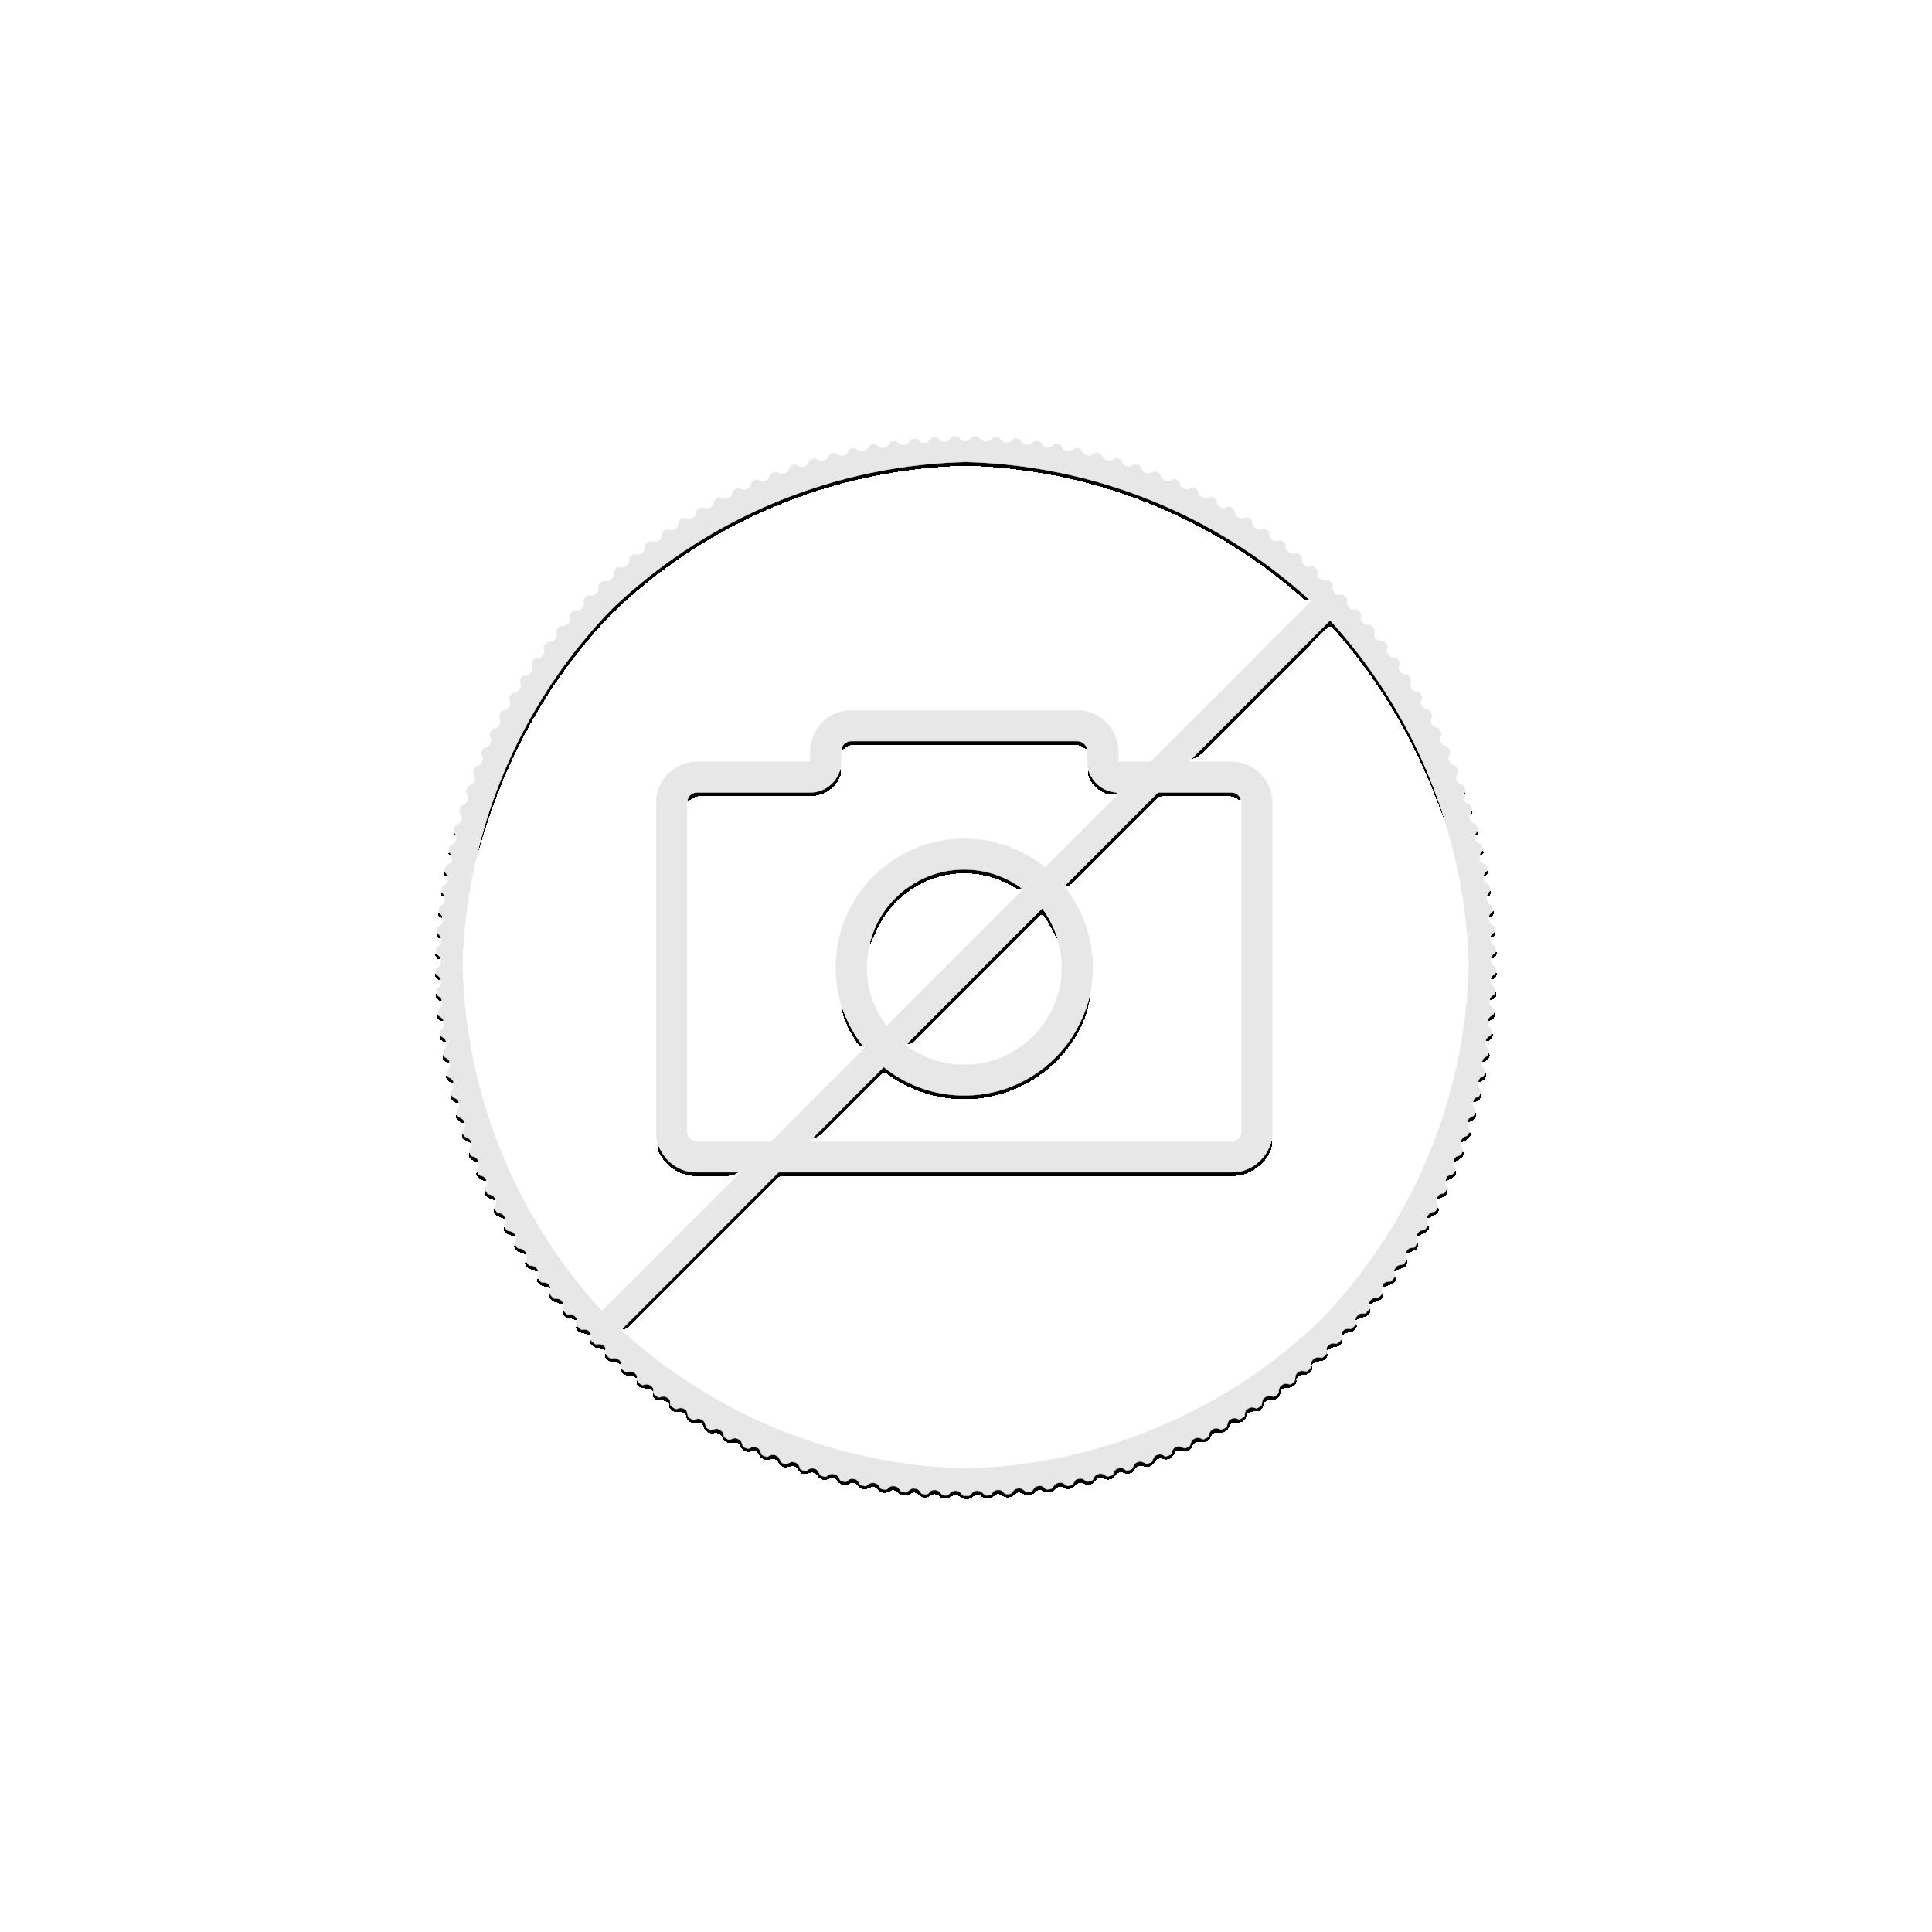 1 troy ounce platina munt Britannia 2021